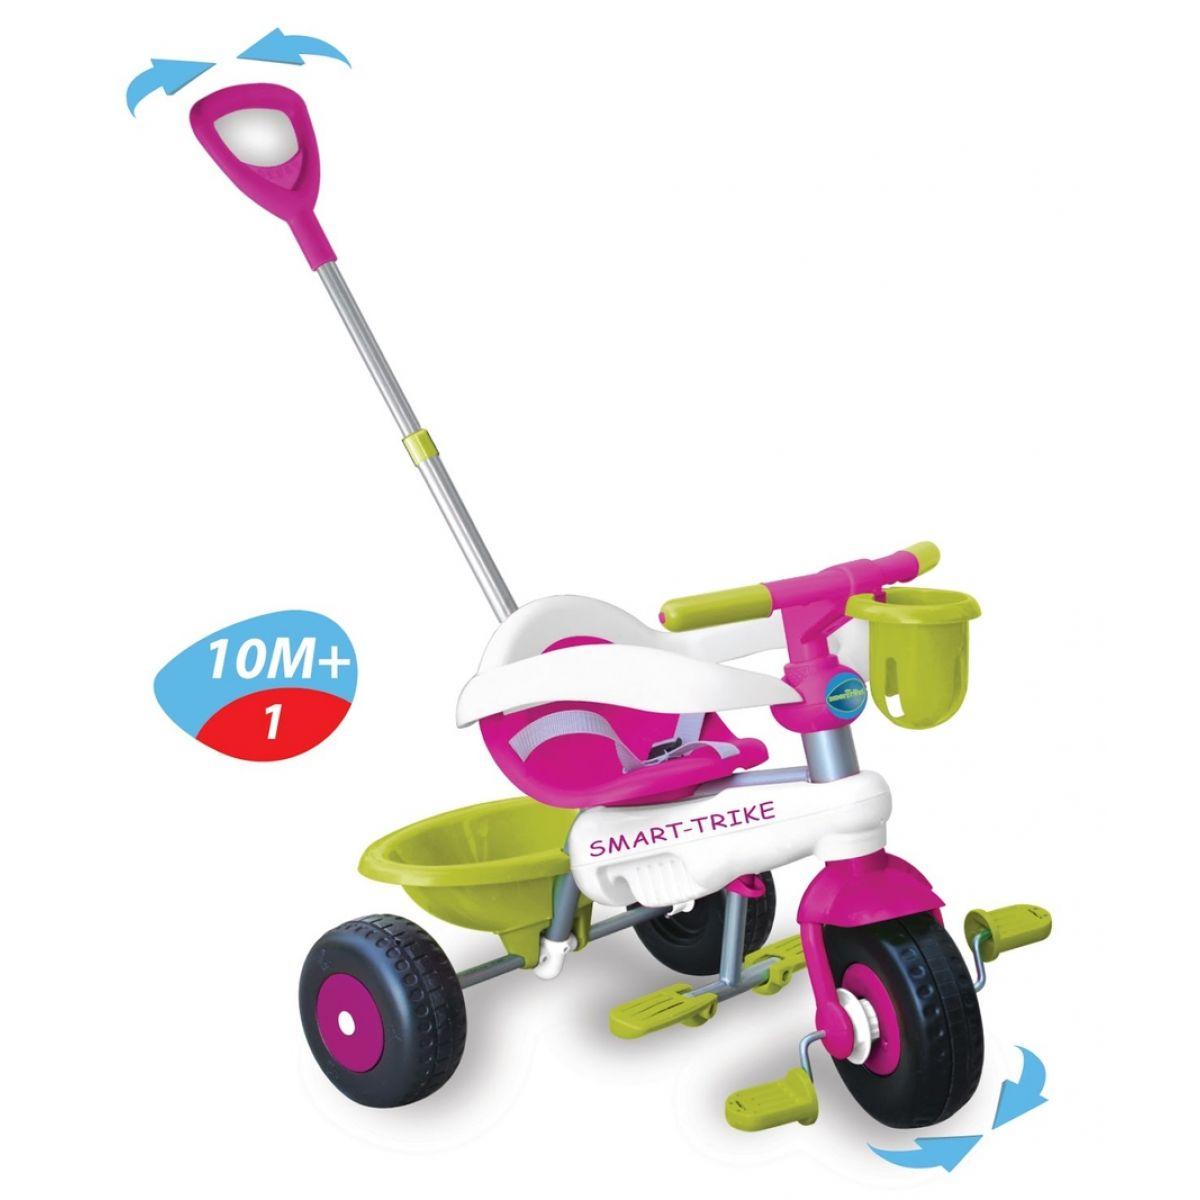 Tříkolka Lollipop fialovo-bílá Smart Trike